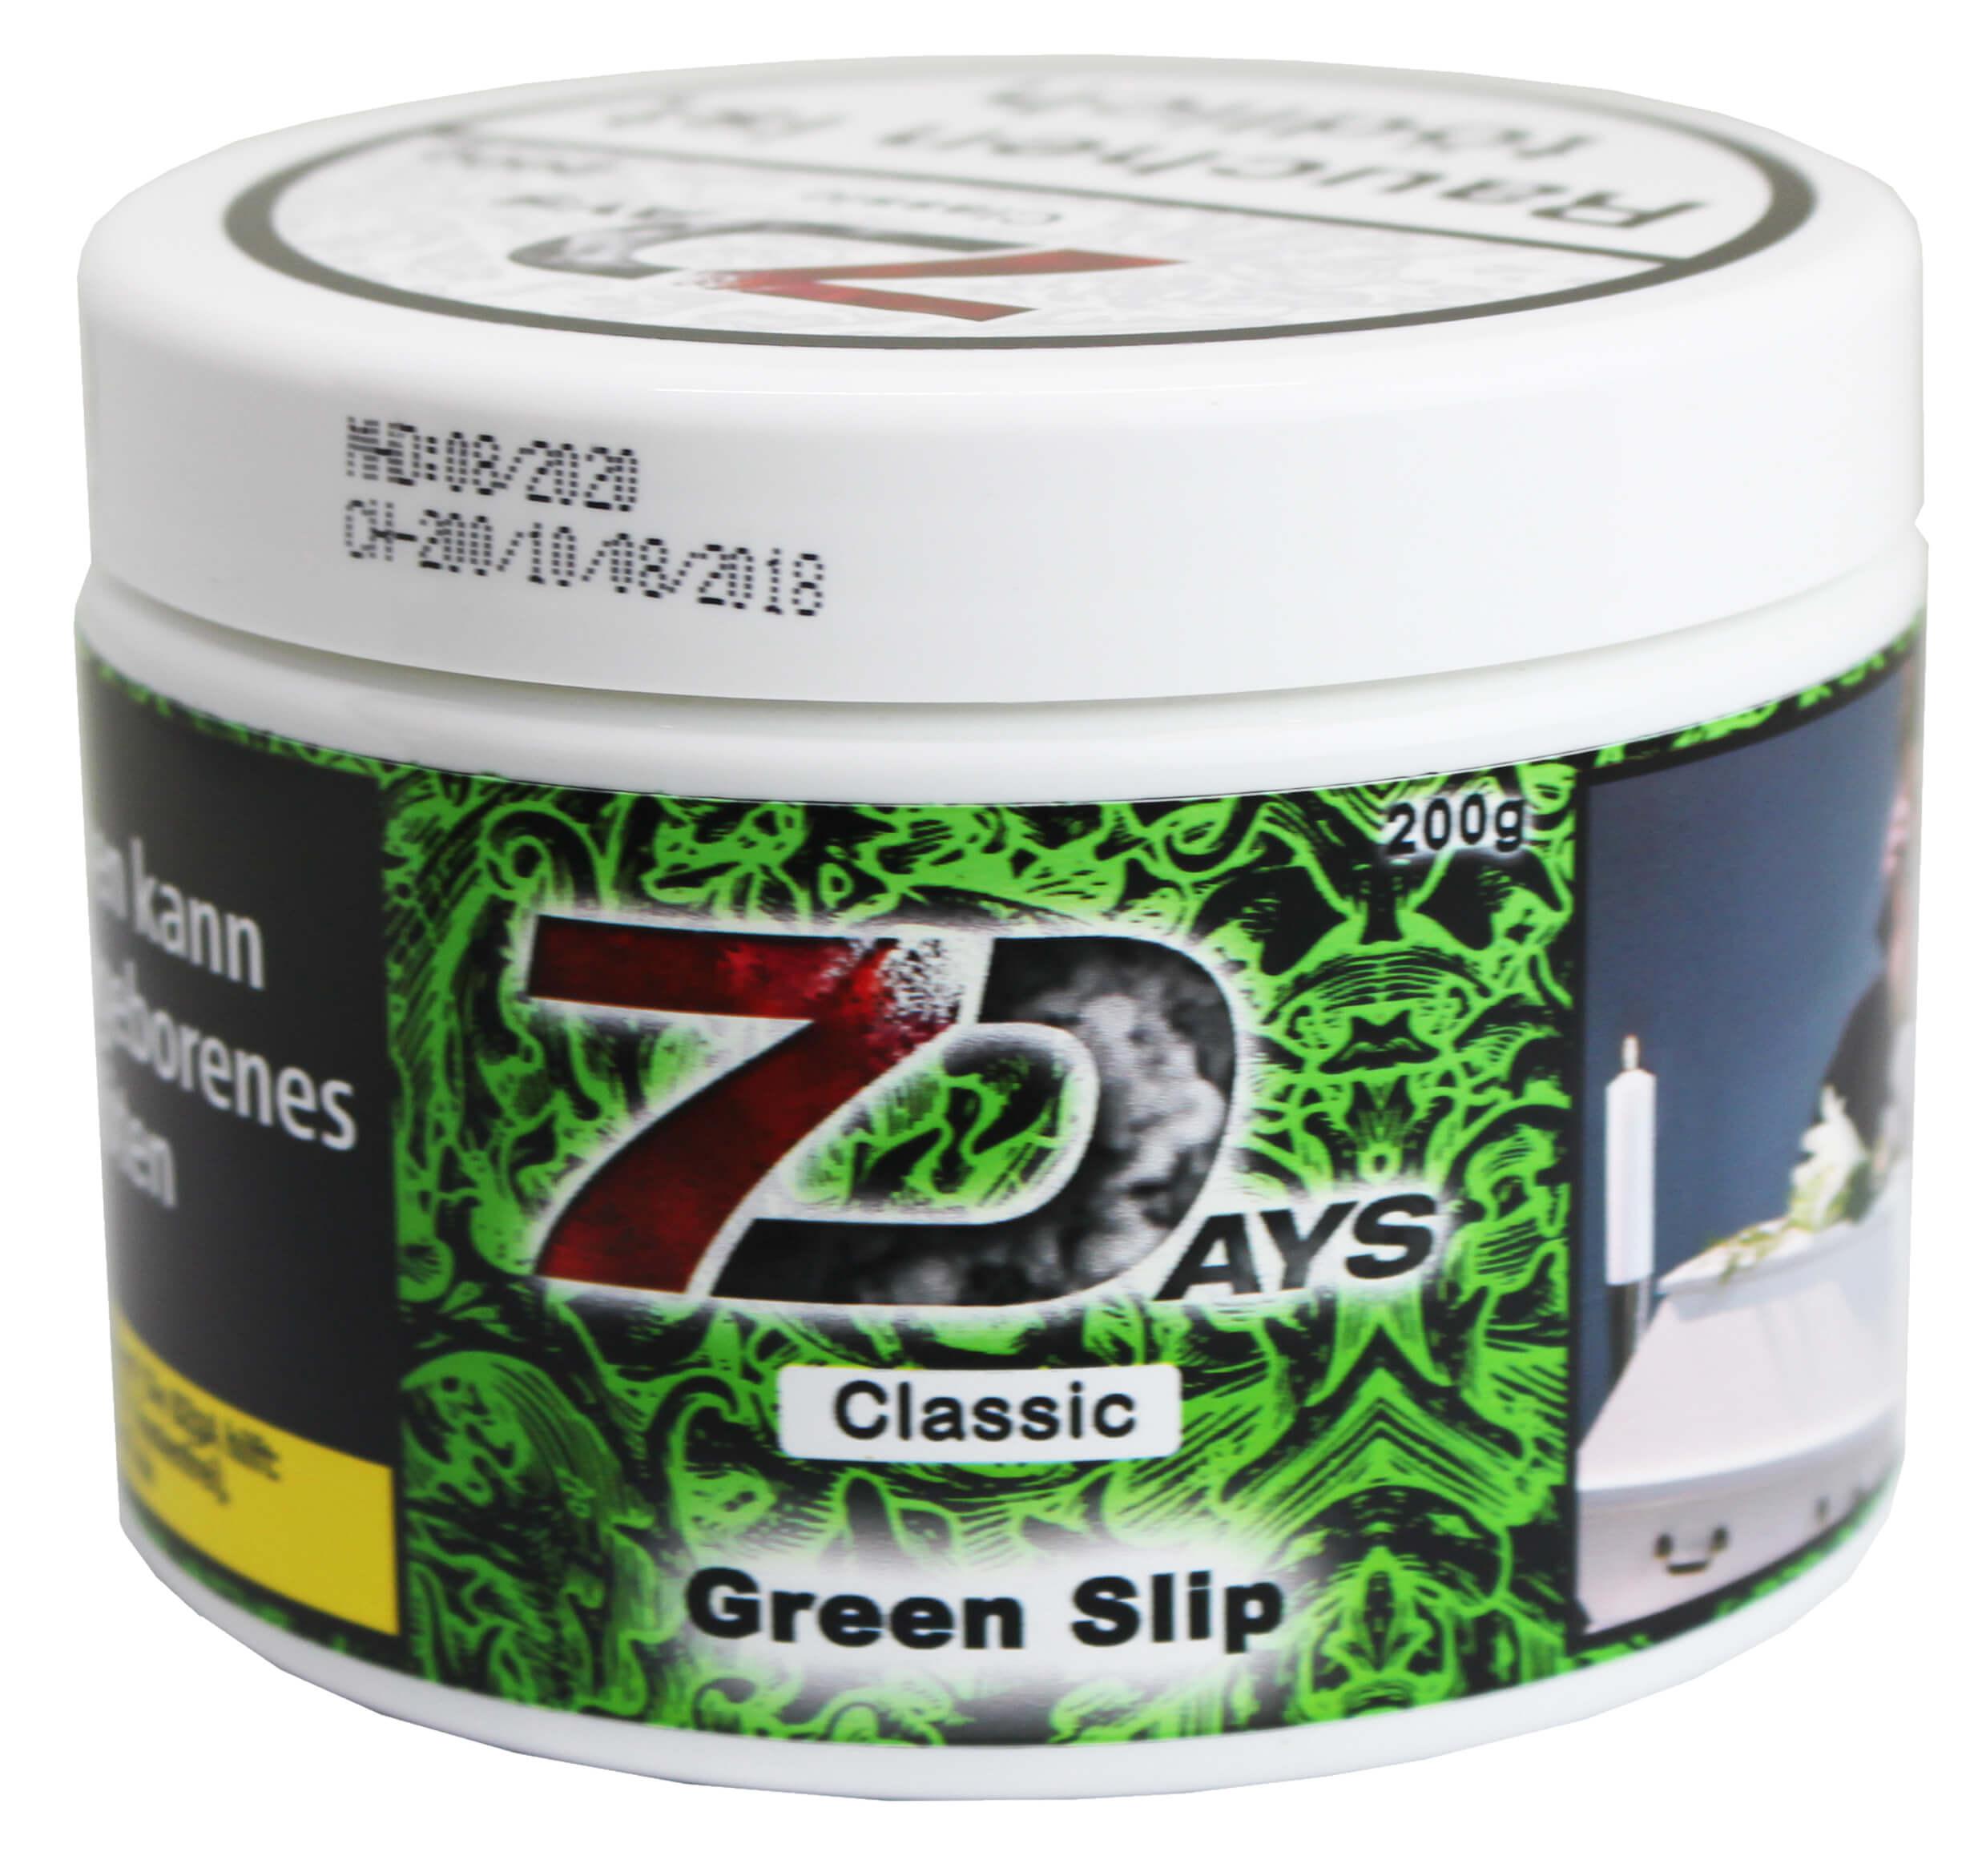 7 Days Tabak - Green Slip Classic 200g